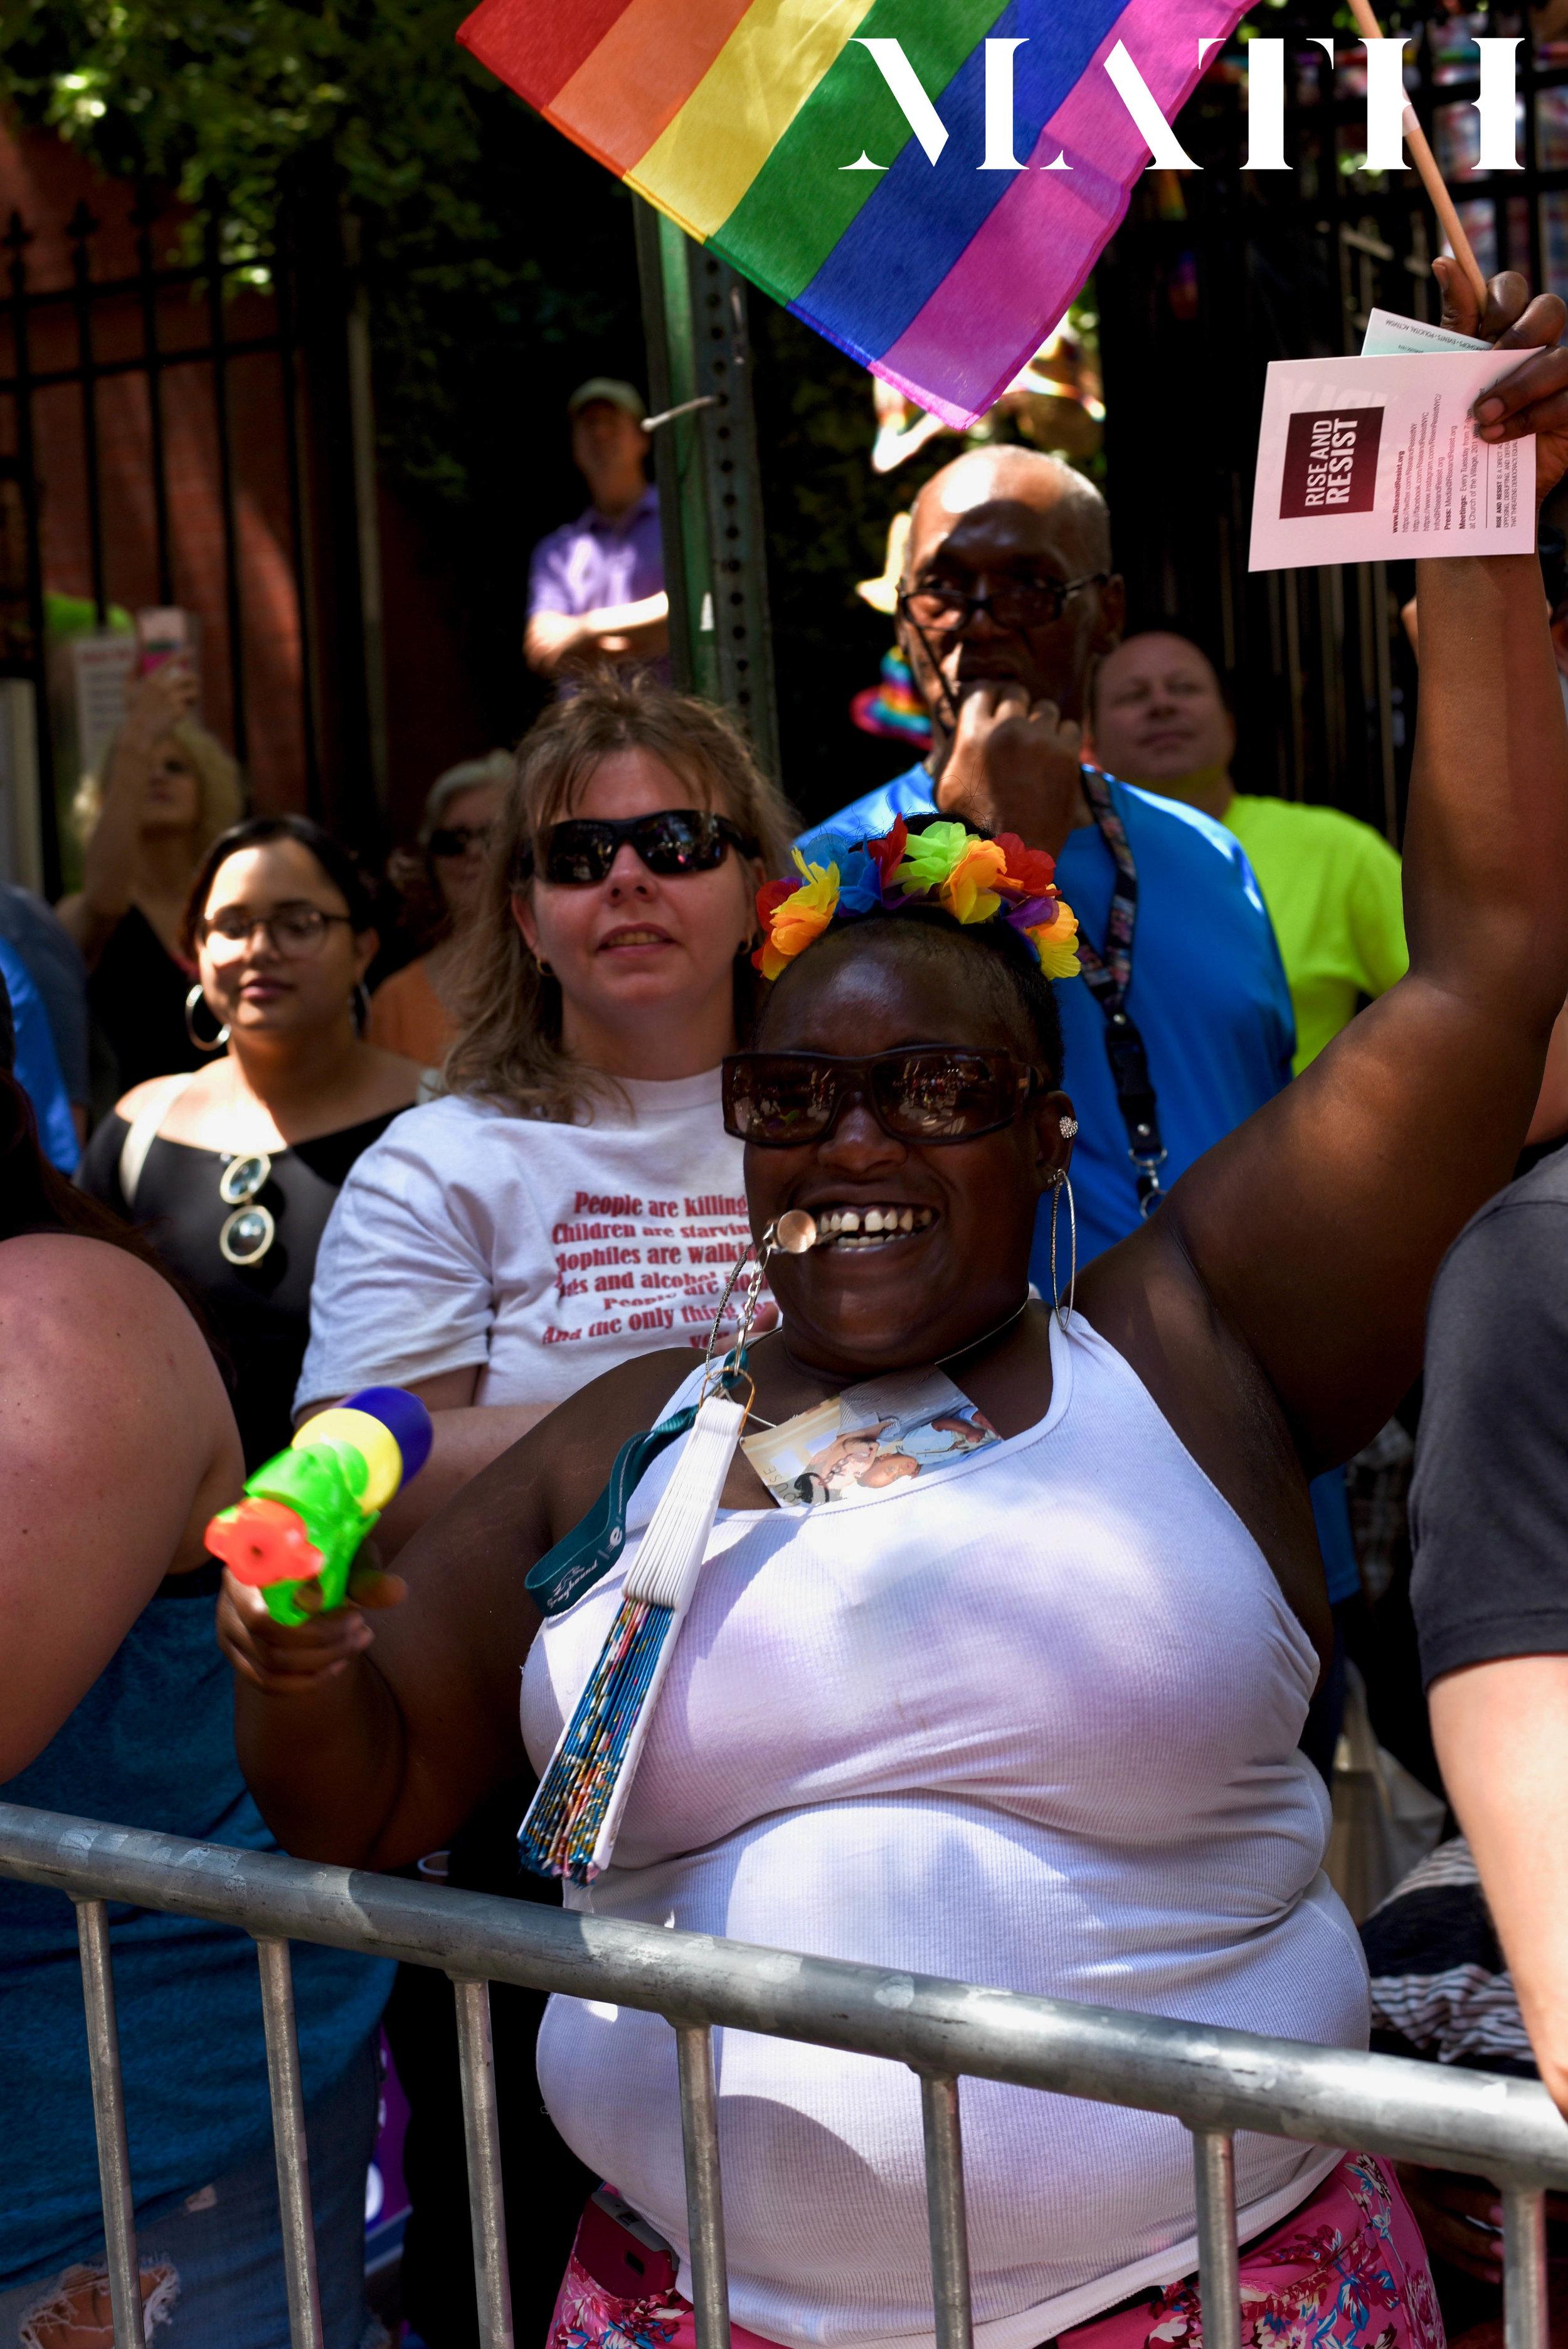 NYC Pride_Ginger Hollander 15.jpg